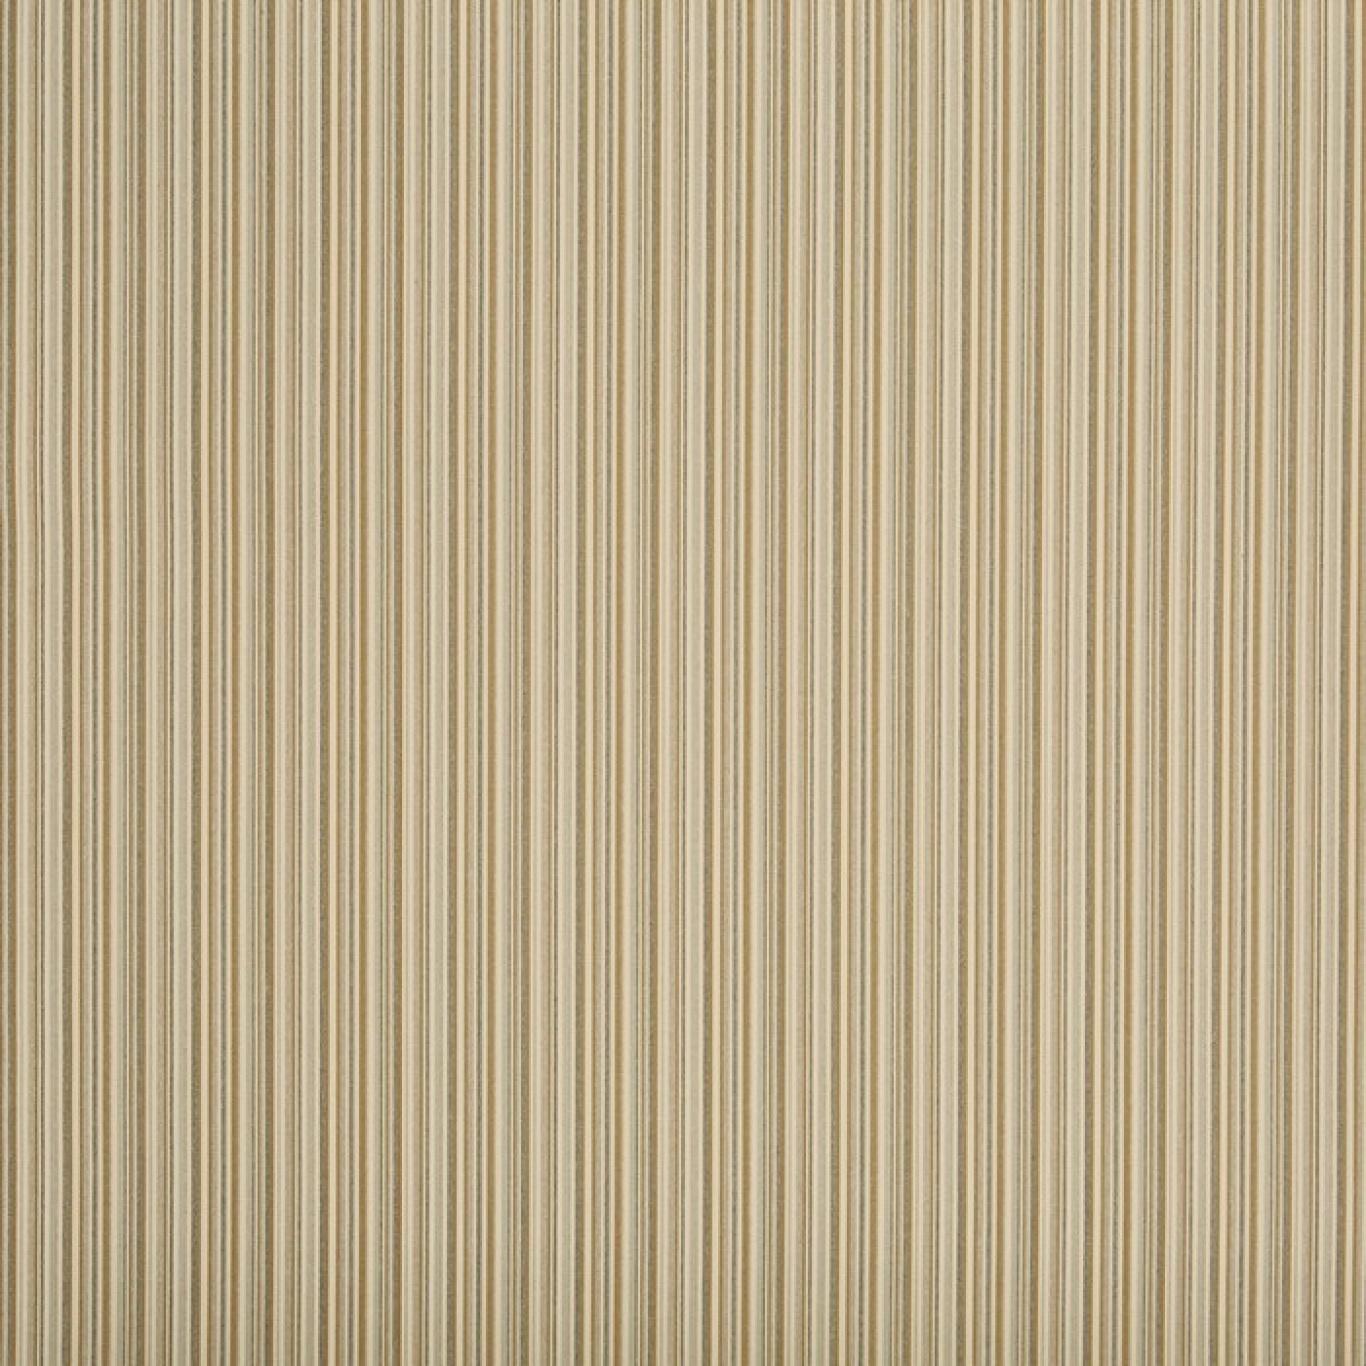 Image of Prestigious Langley Almond FR Fabric 2018/012